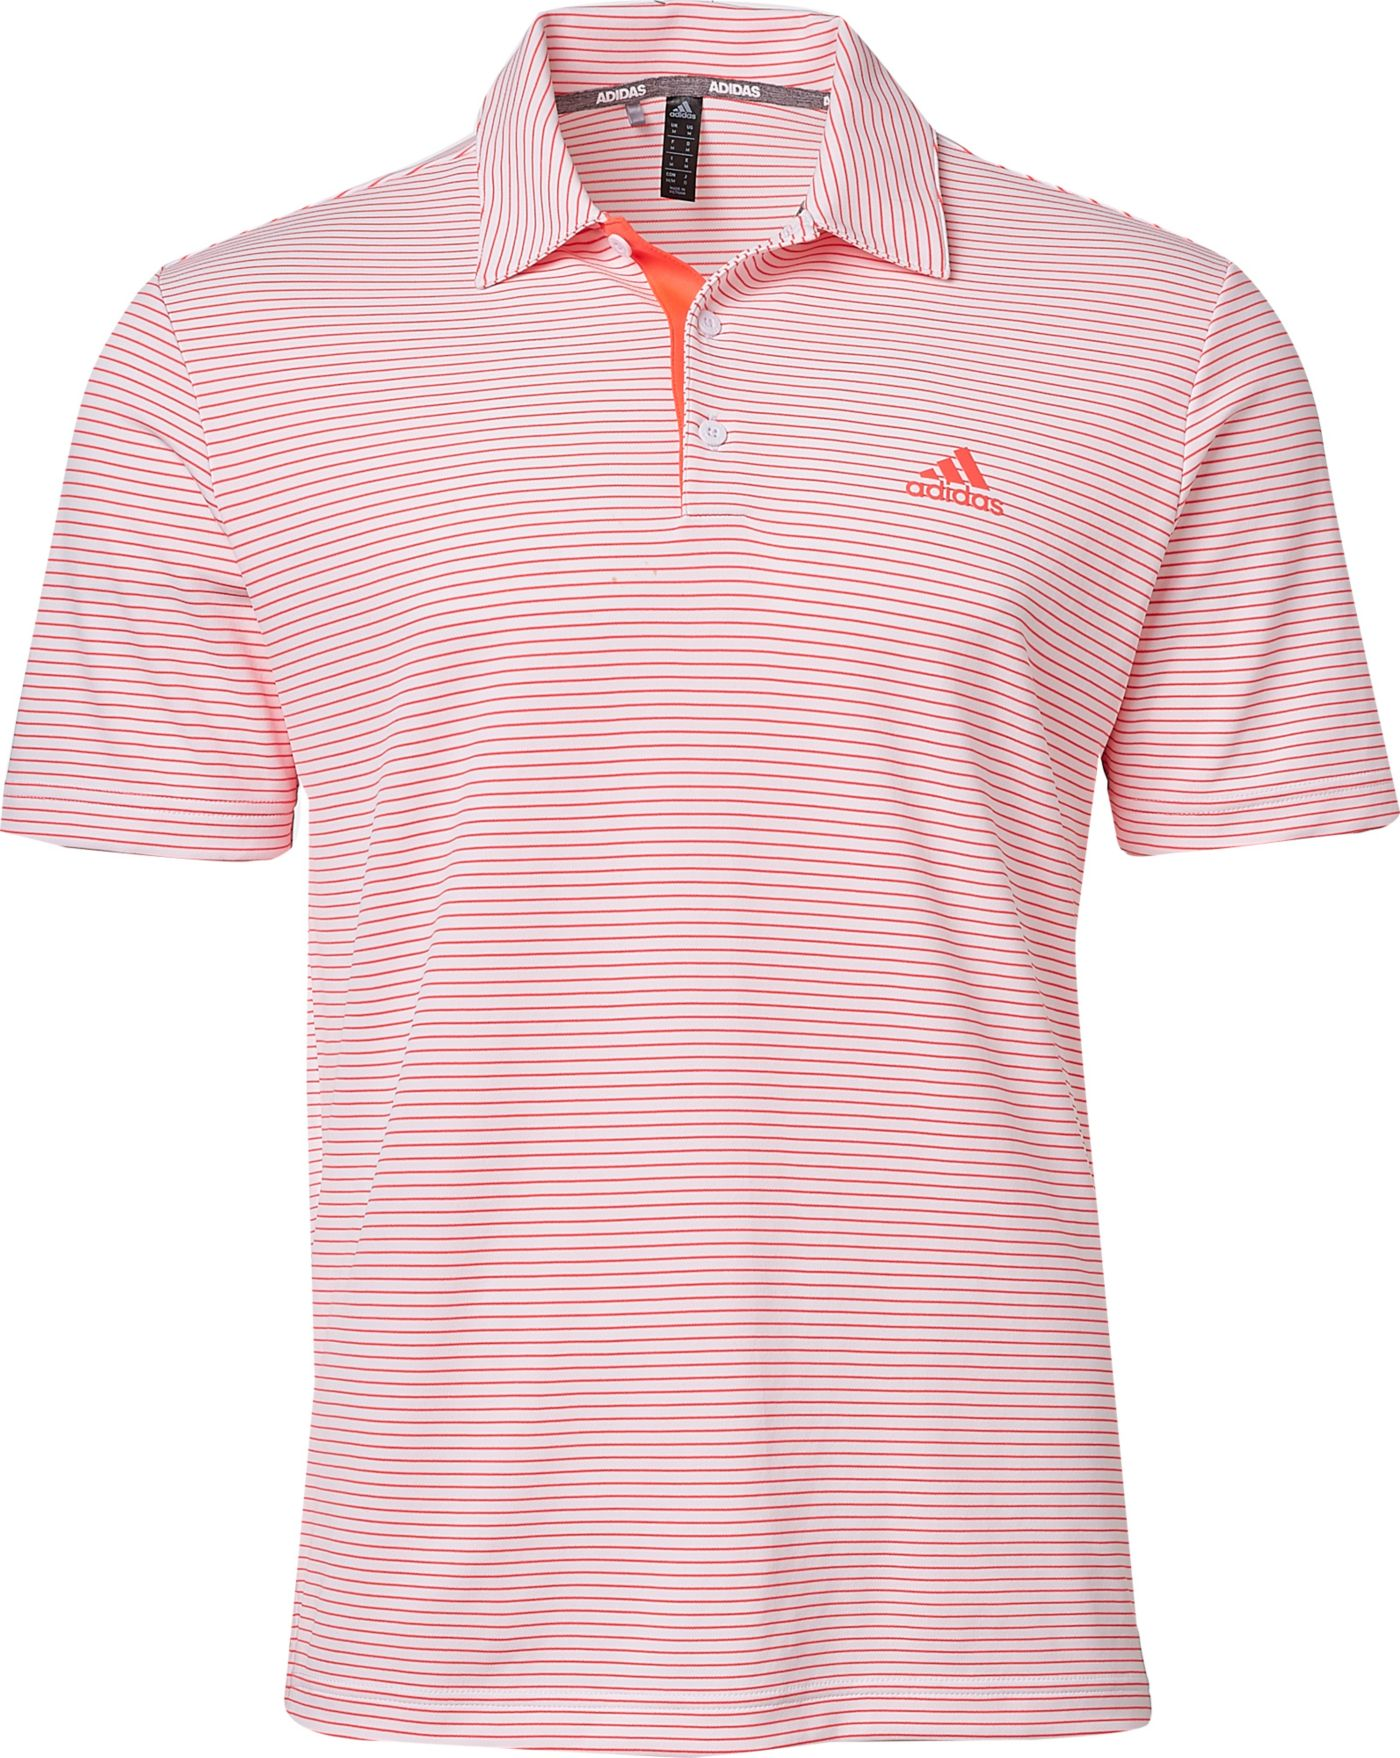 adidas Men's Drive 2 Color Stripe Golf Polo